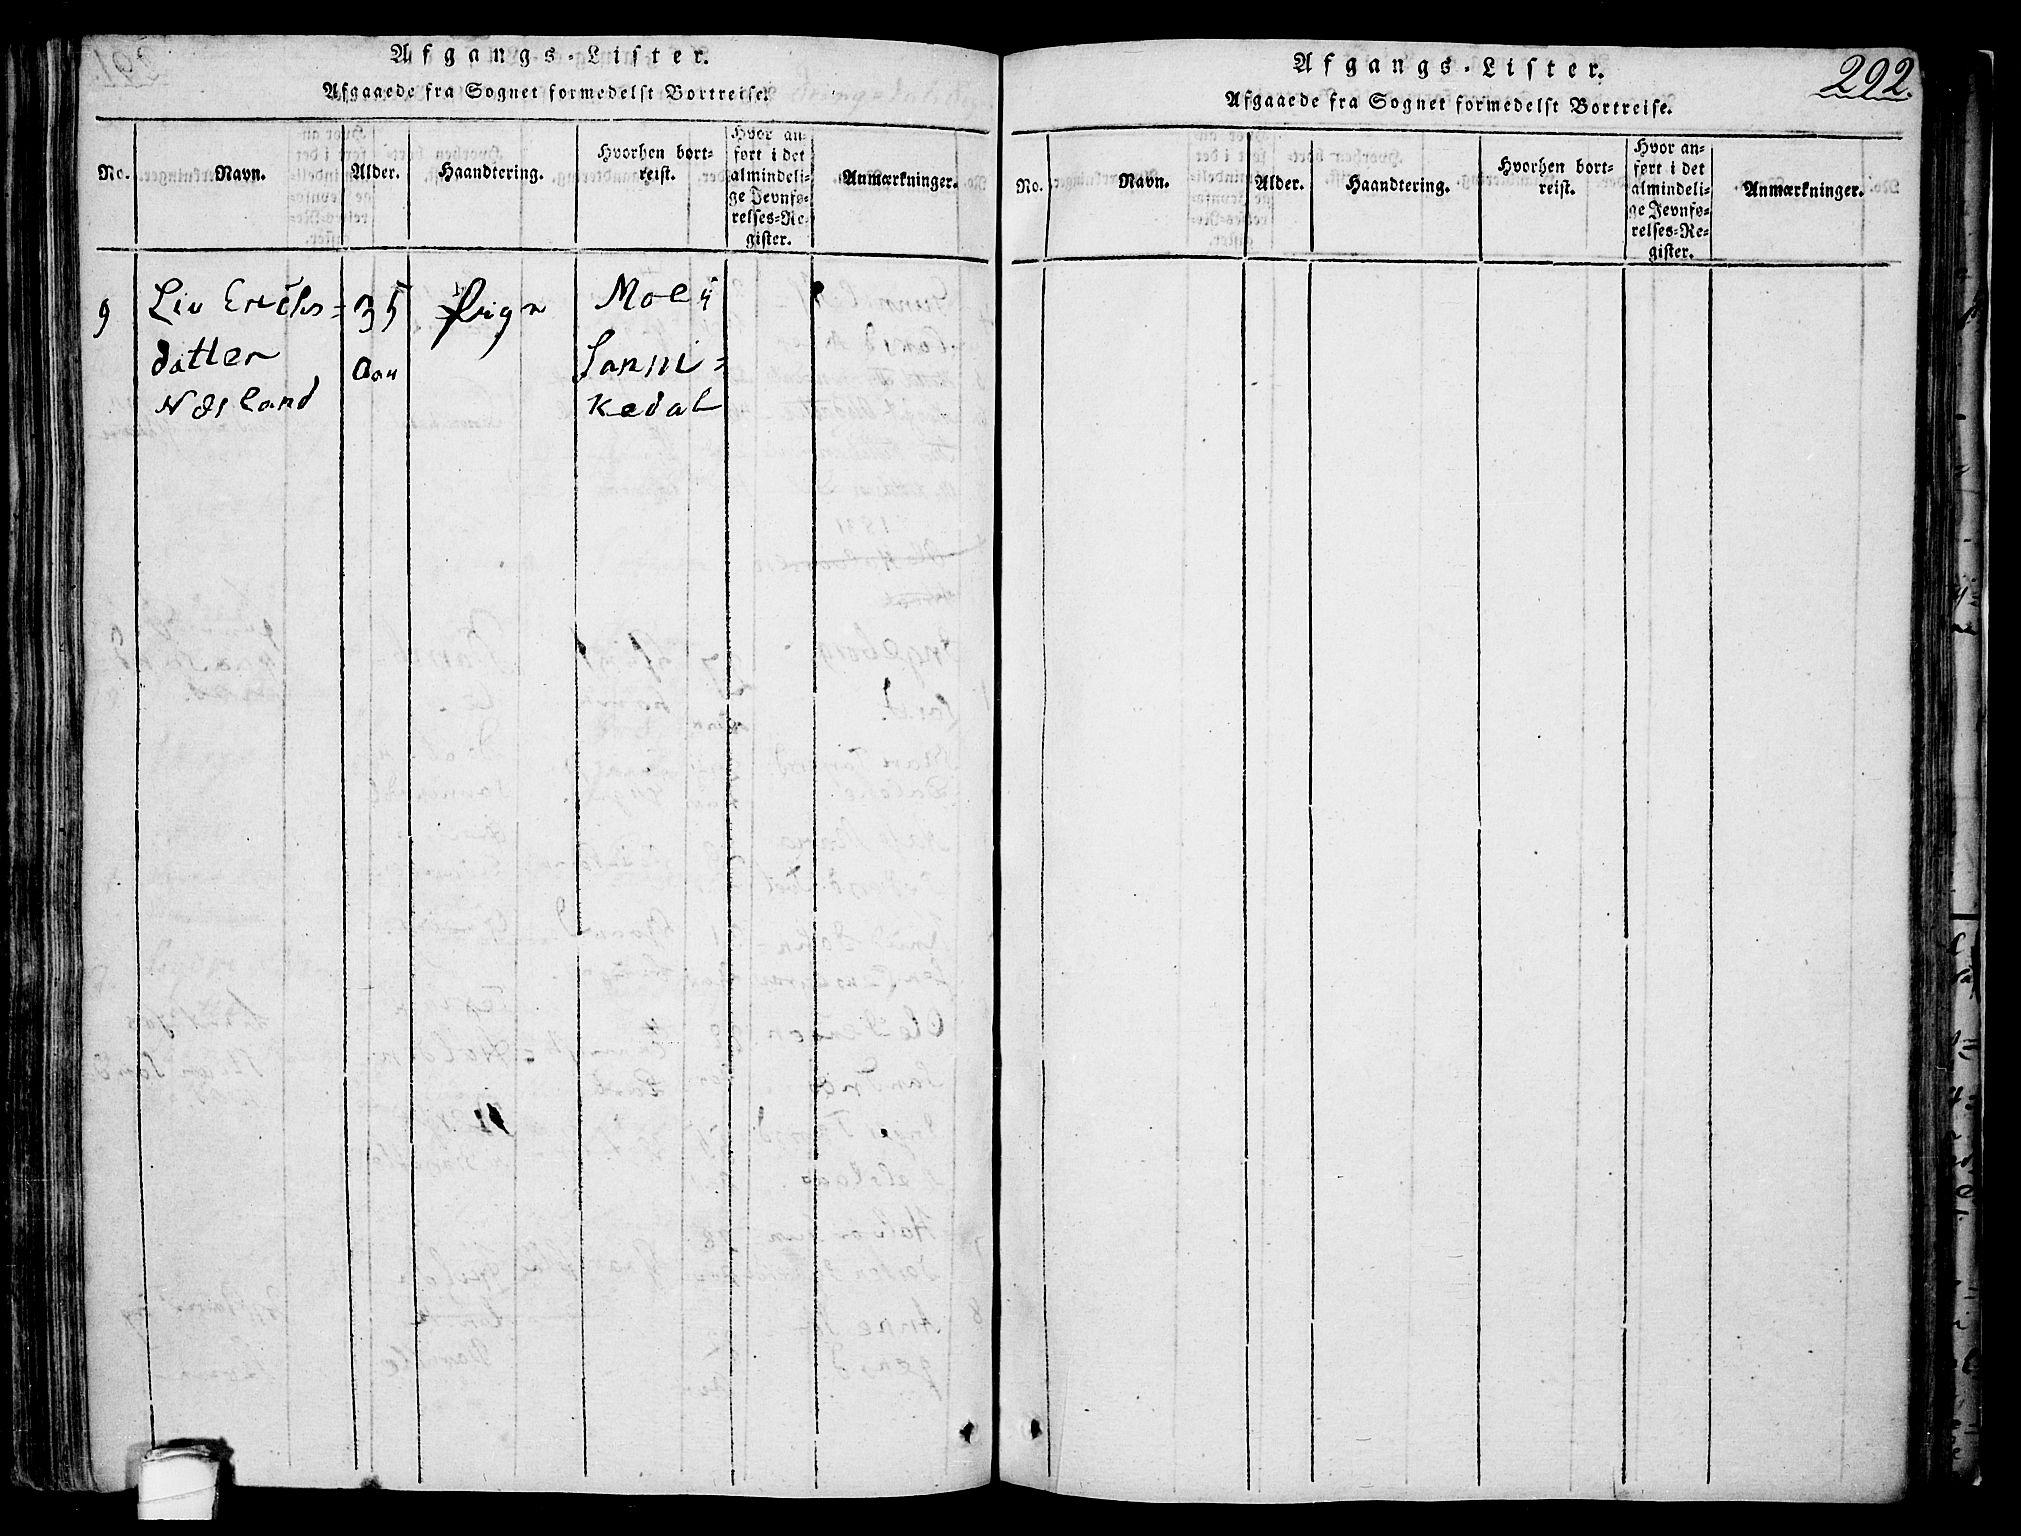 SAKO, Drangedal kirkebøker, F/Fa/L0005: Ministerialbok nr. 5 /1, 1814-1831, s. 292